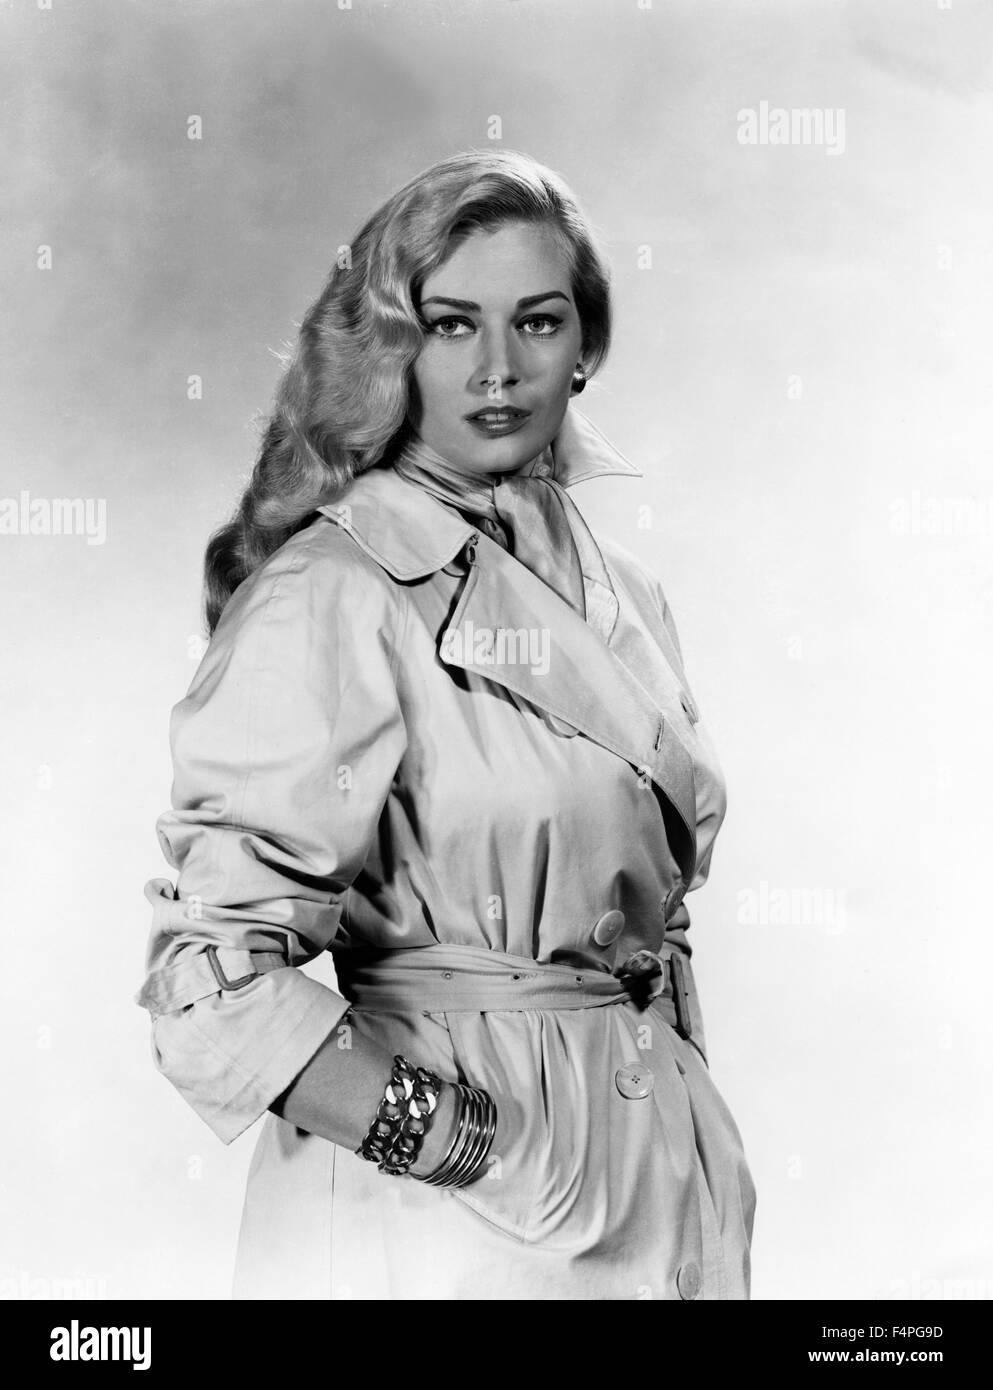 Anita Ekberg 1957-1958 - Stock Image